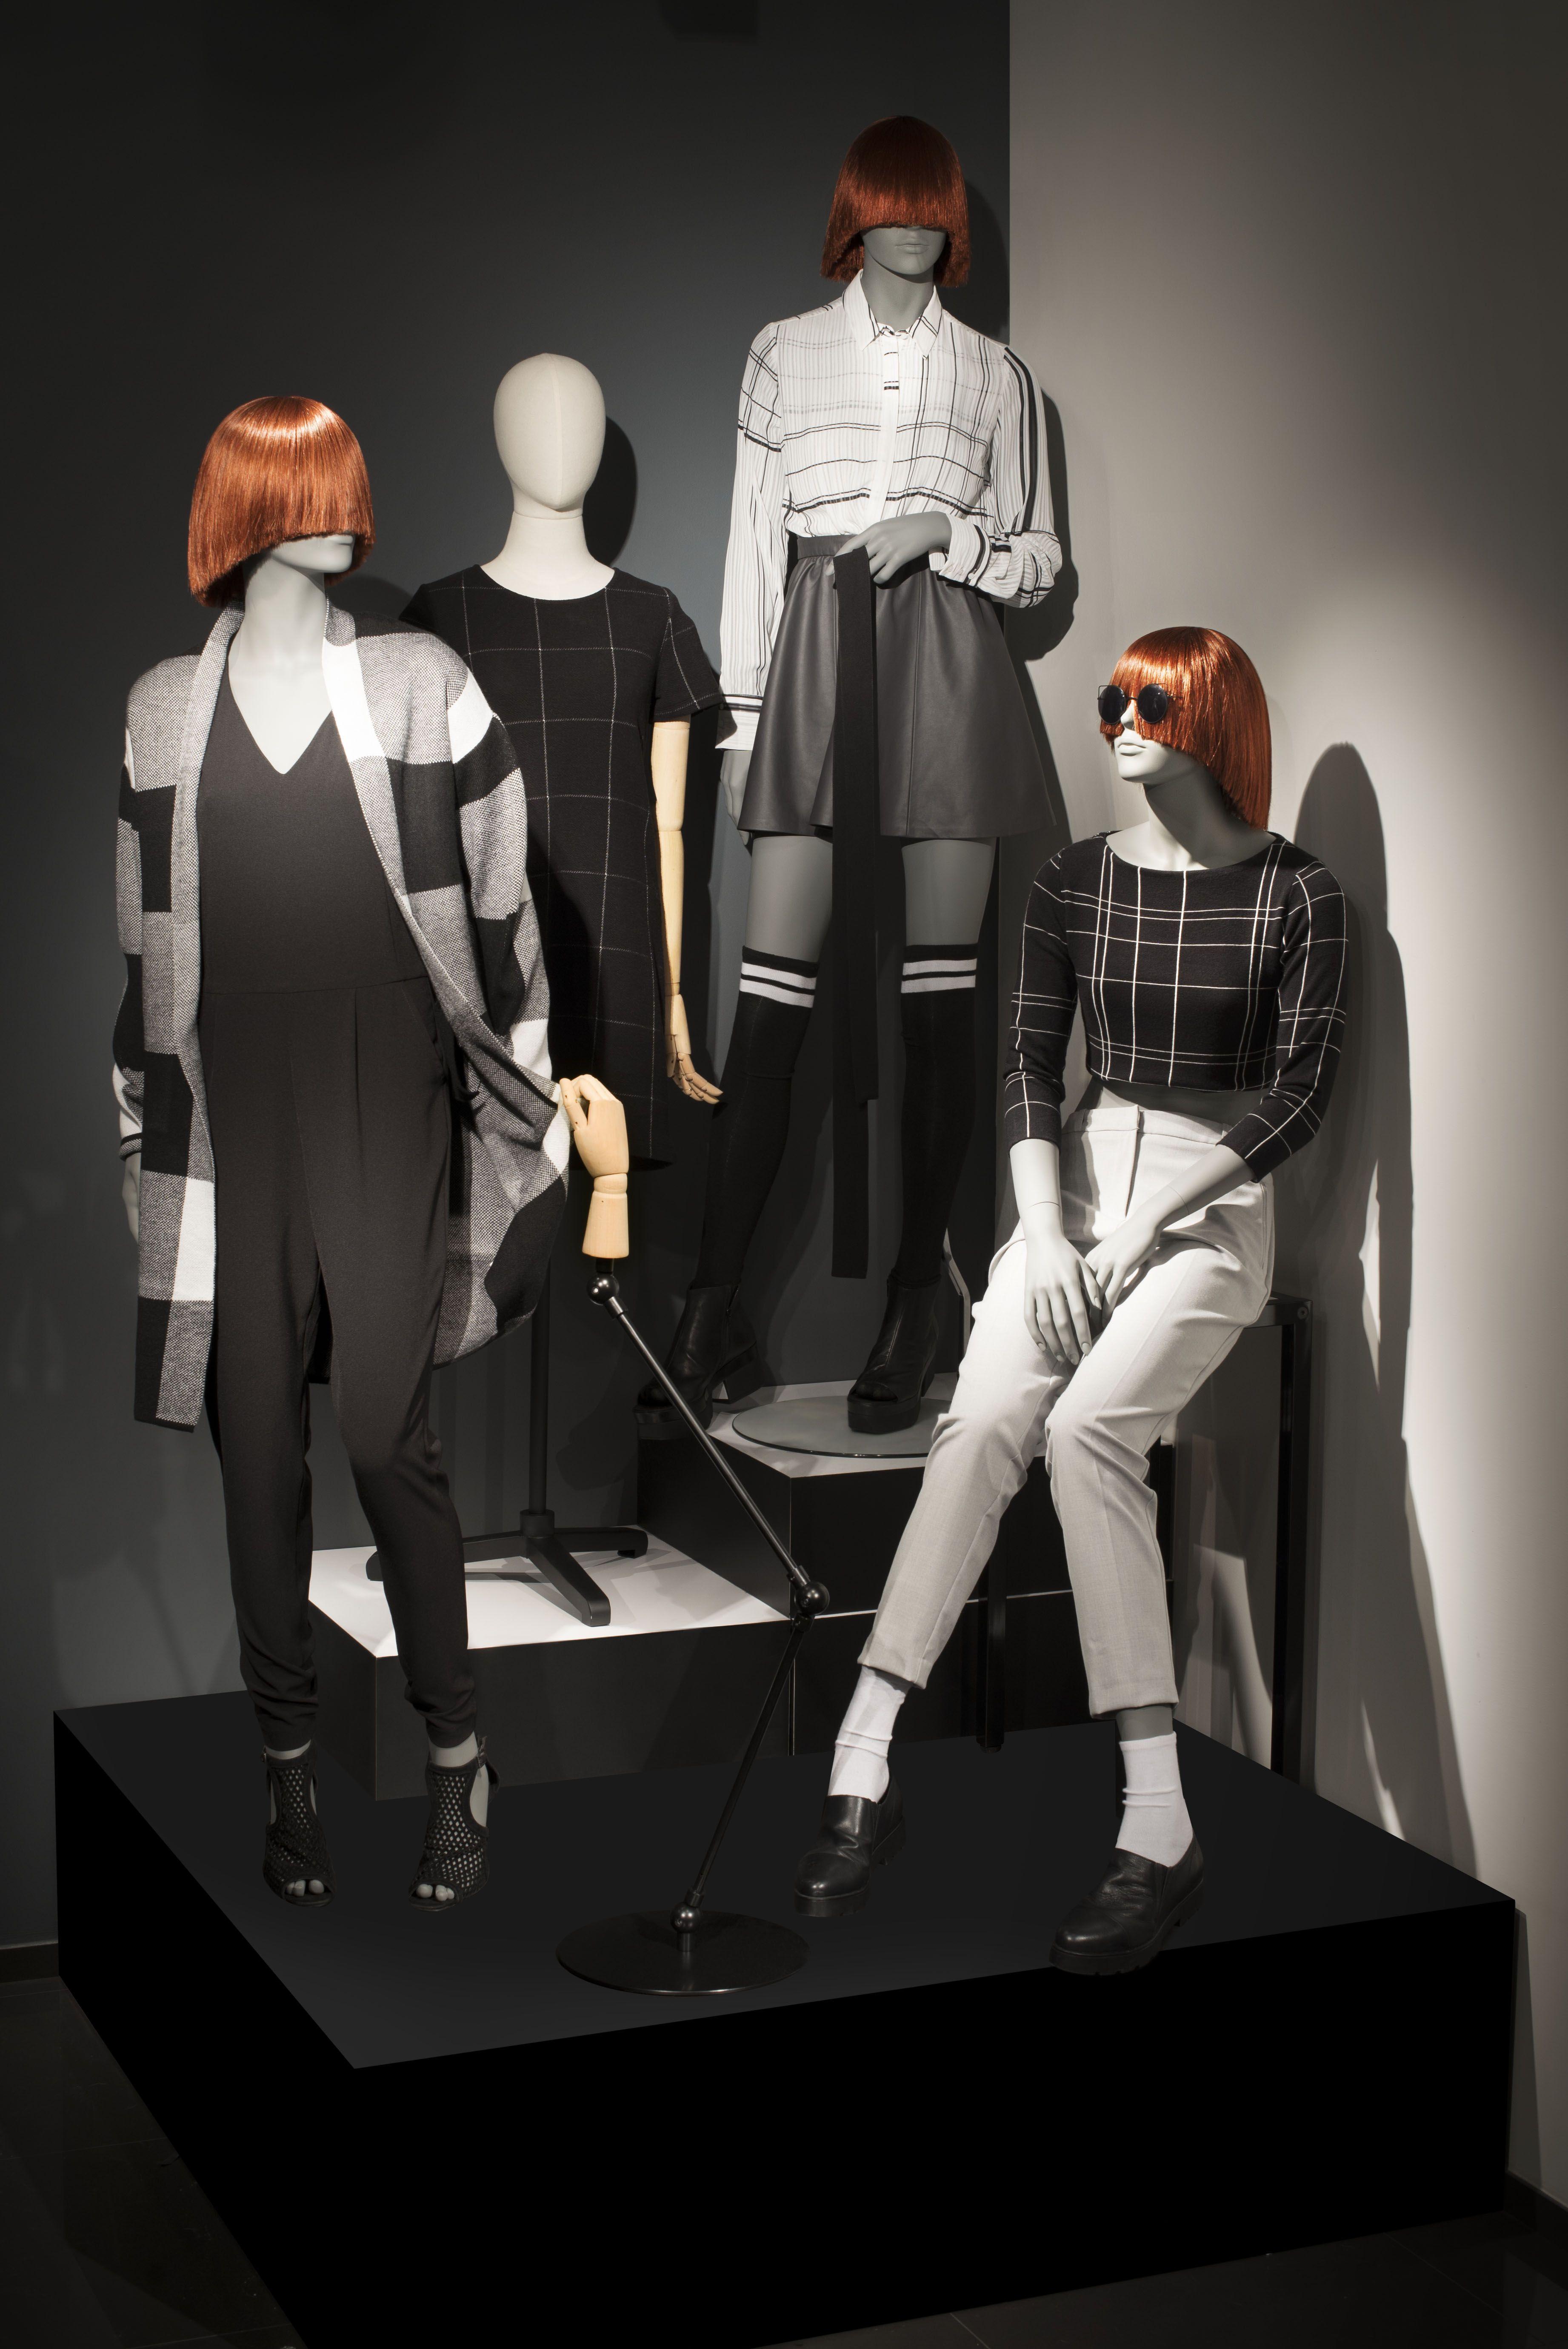 NEXT - Top collection by More Mannequins #FemaleMannequin #boutique #fashion